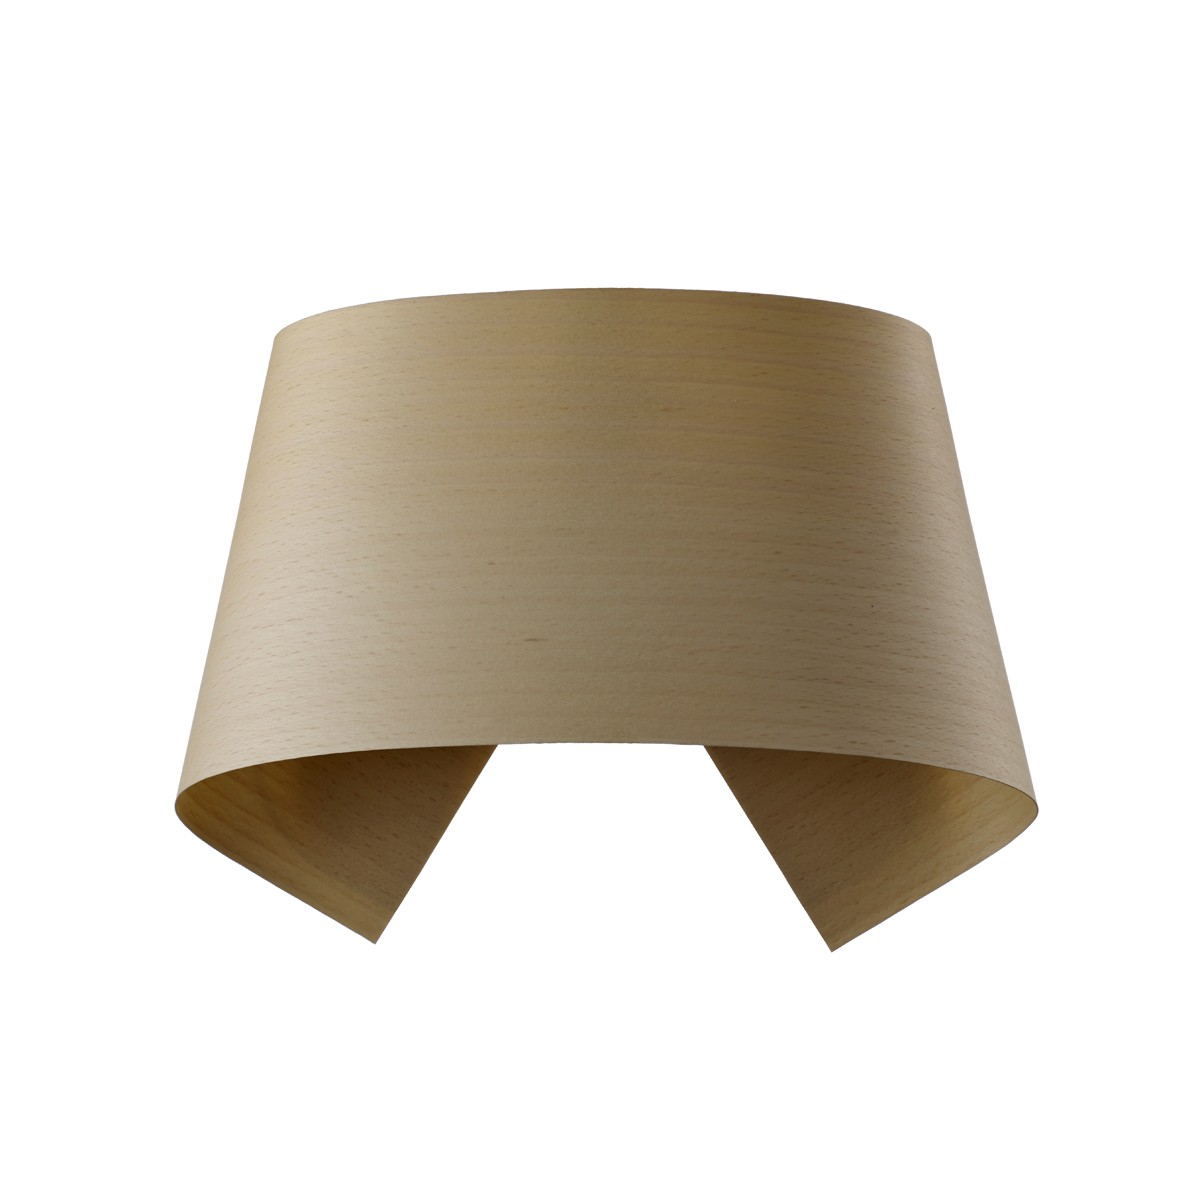 LZF Lamps Hi-Collar LED Wandleuchte, Buche